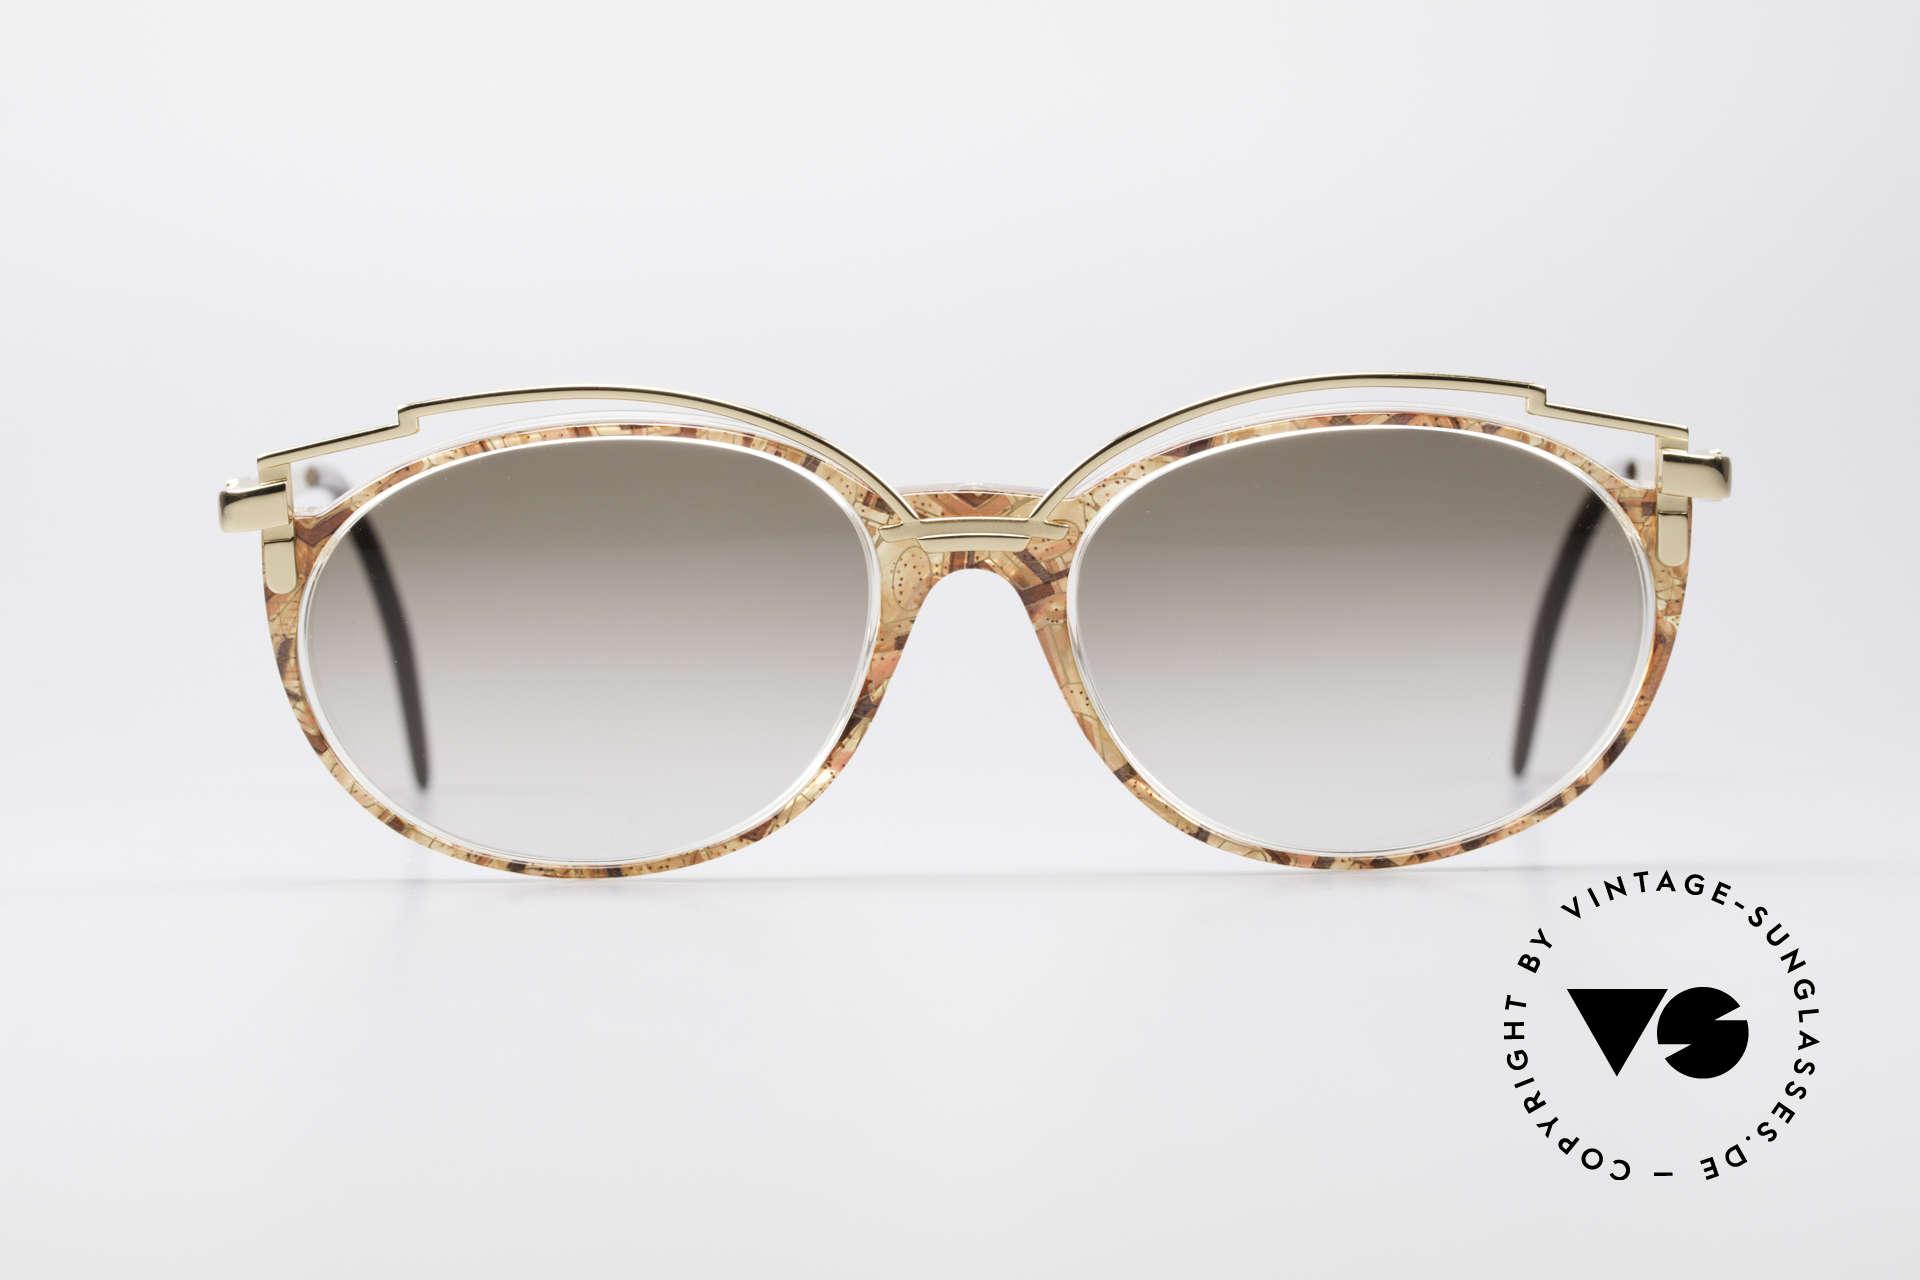 Cazal 358 90's Ladies Sunglasses Vintage, delightful metal ornamentation above the plastic frame, Made for Women